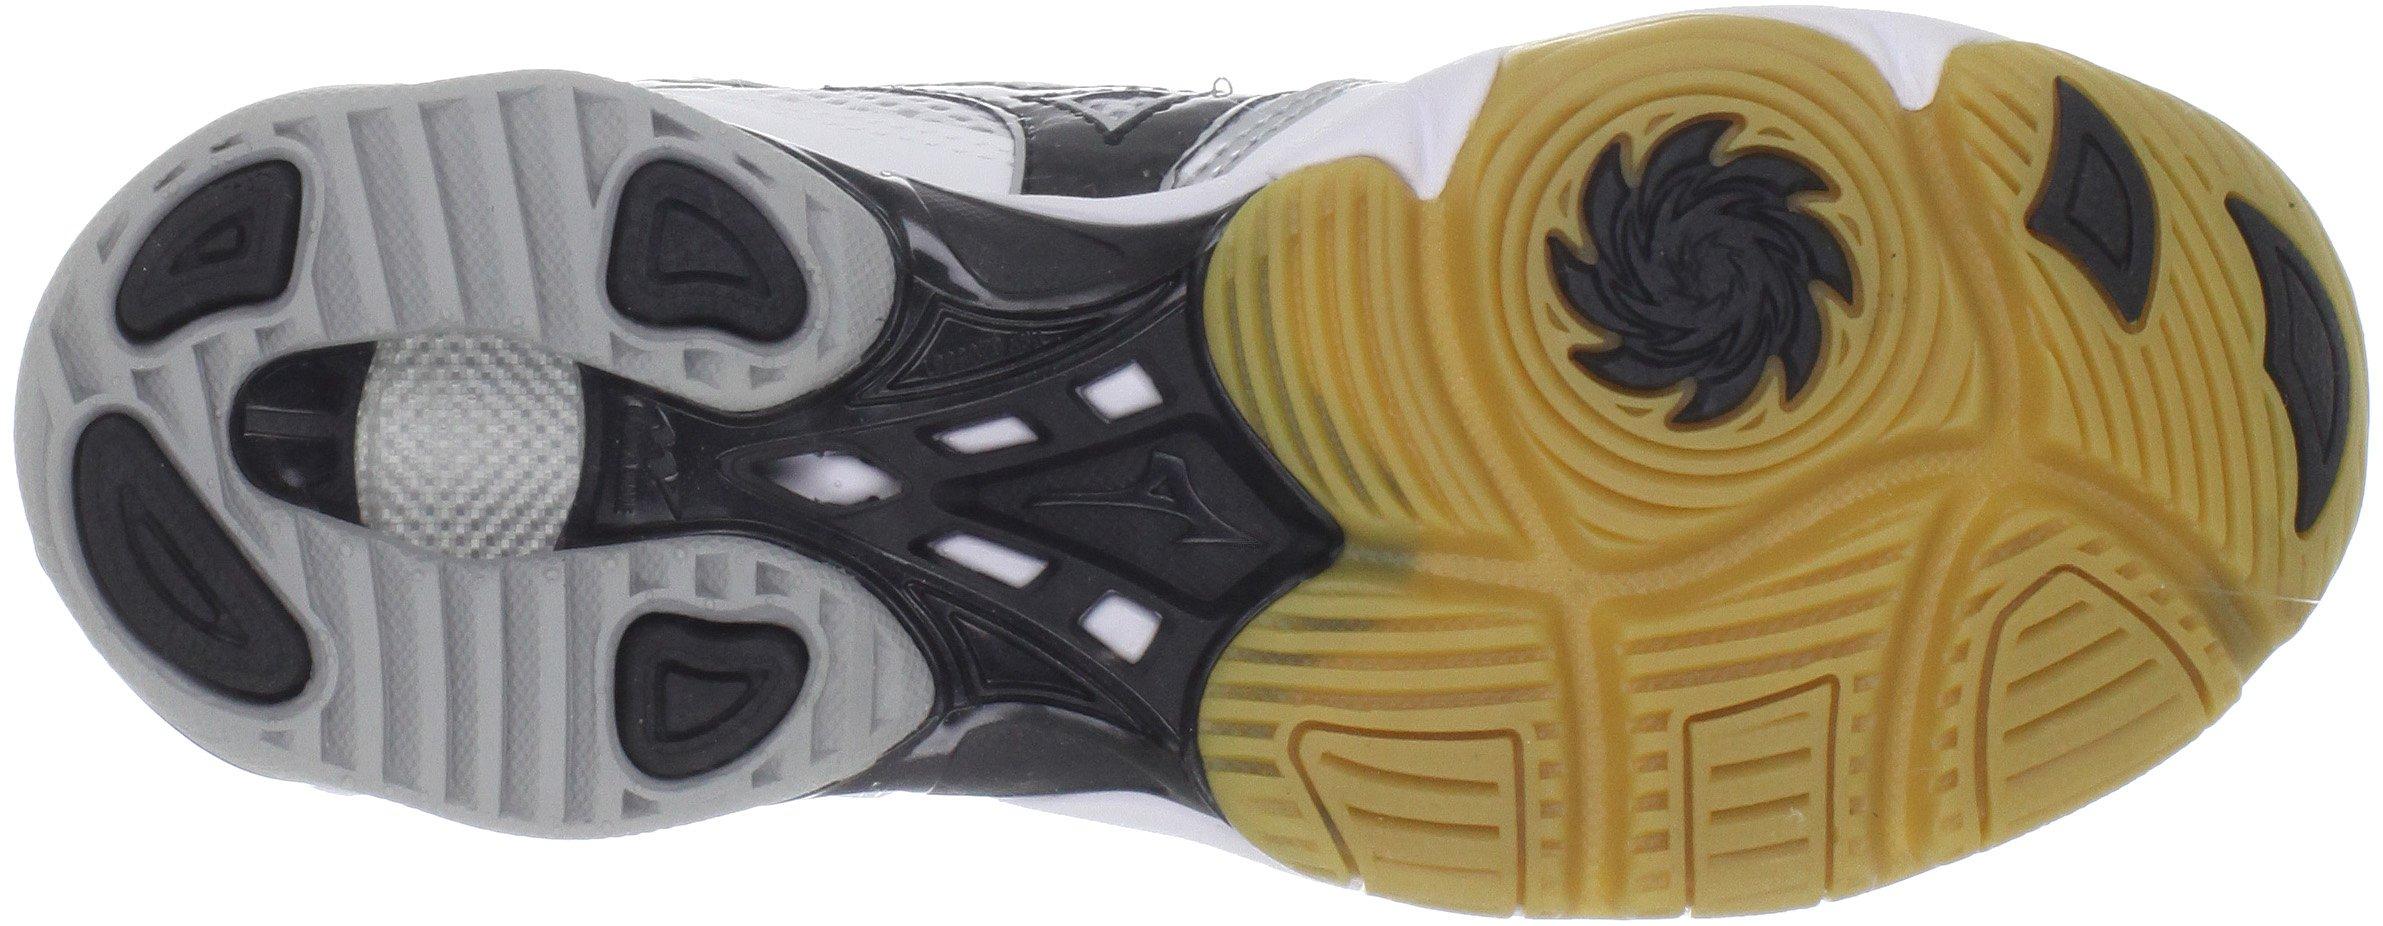 Mizuno Women's Wave Bolt Volleyball Shoe,White/Black,9 M US by Mizuno (Image #3)